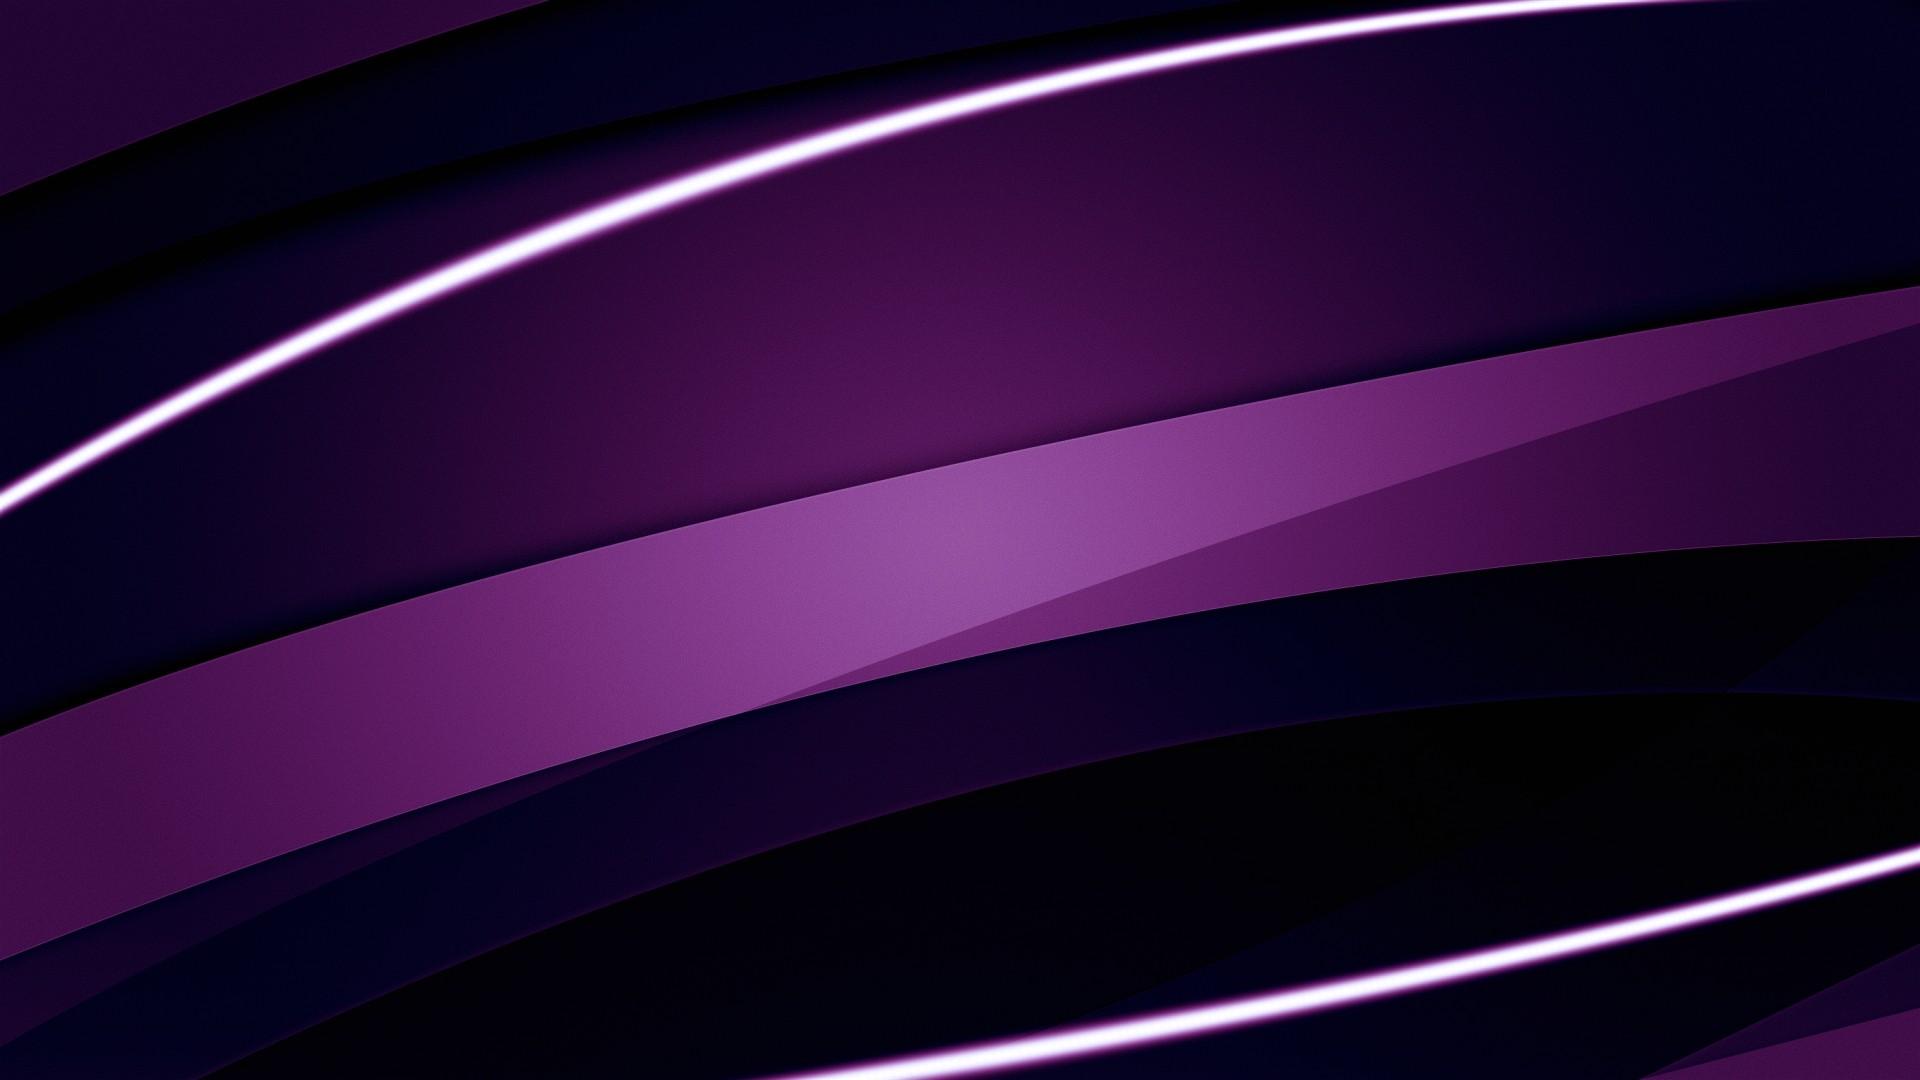 violas oase gayroyal desktop